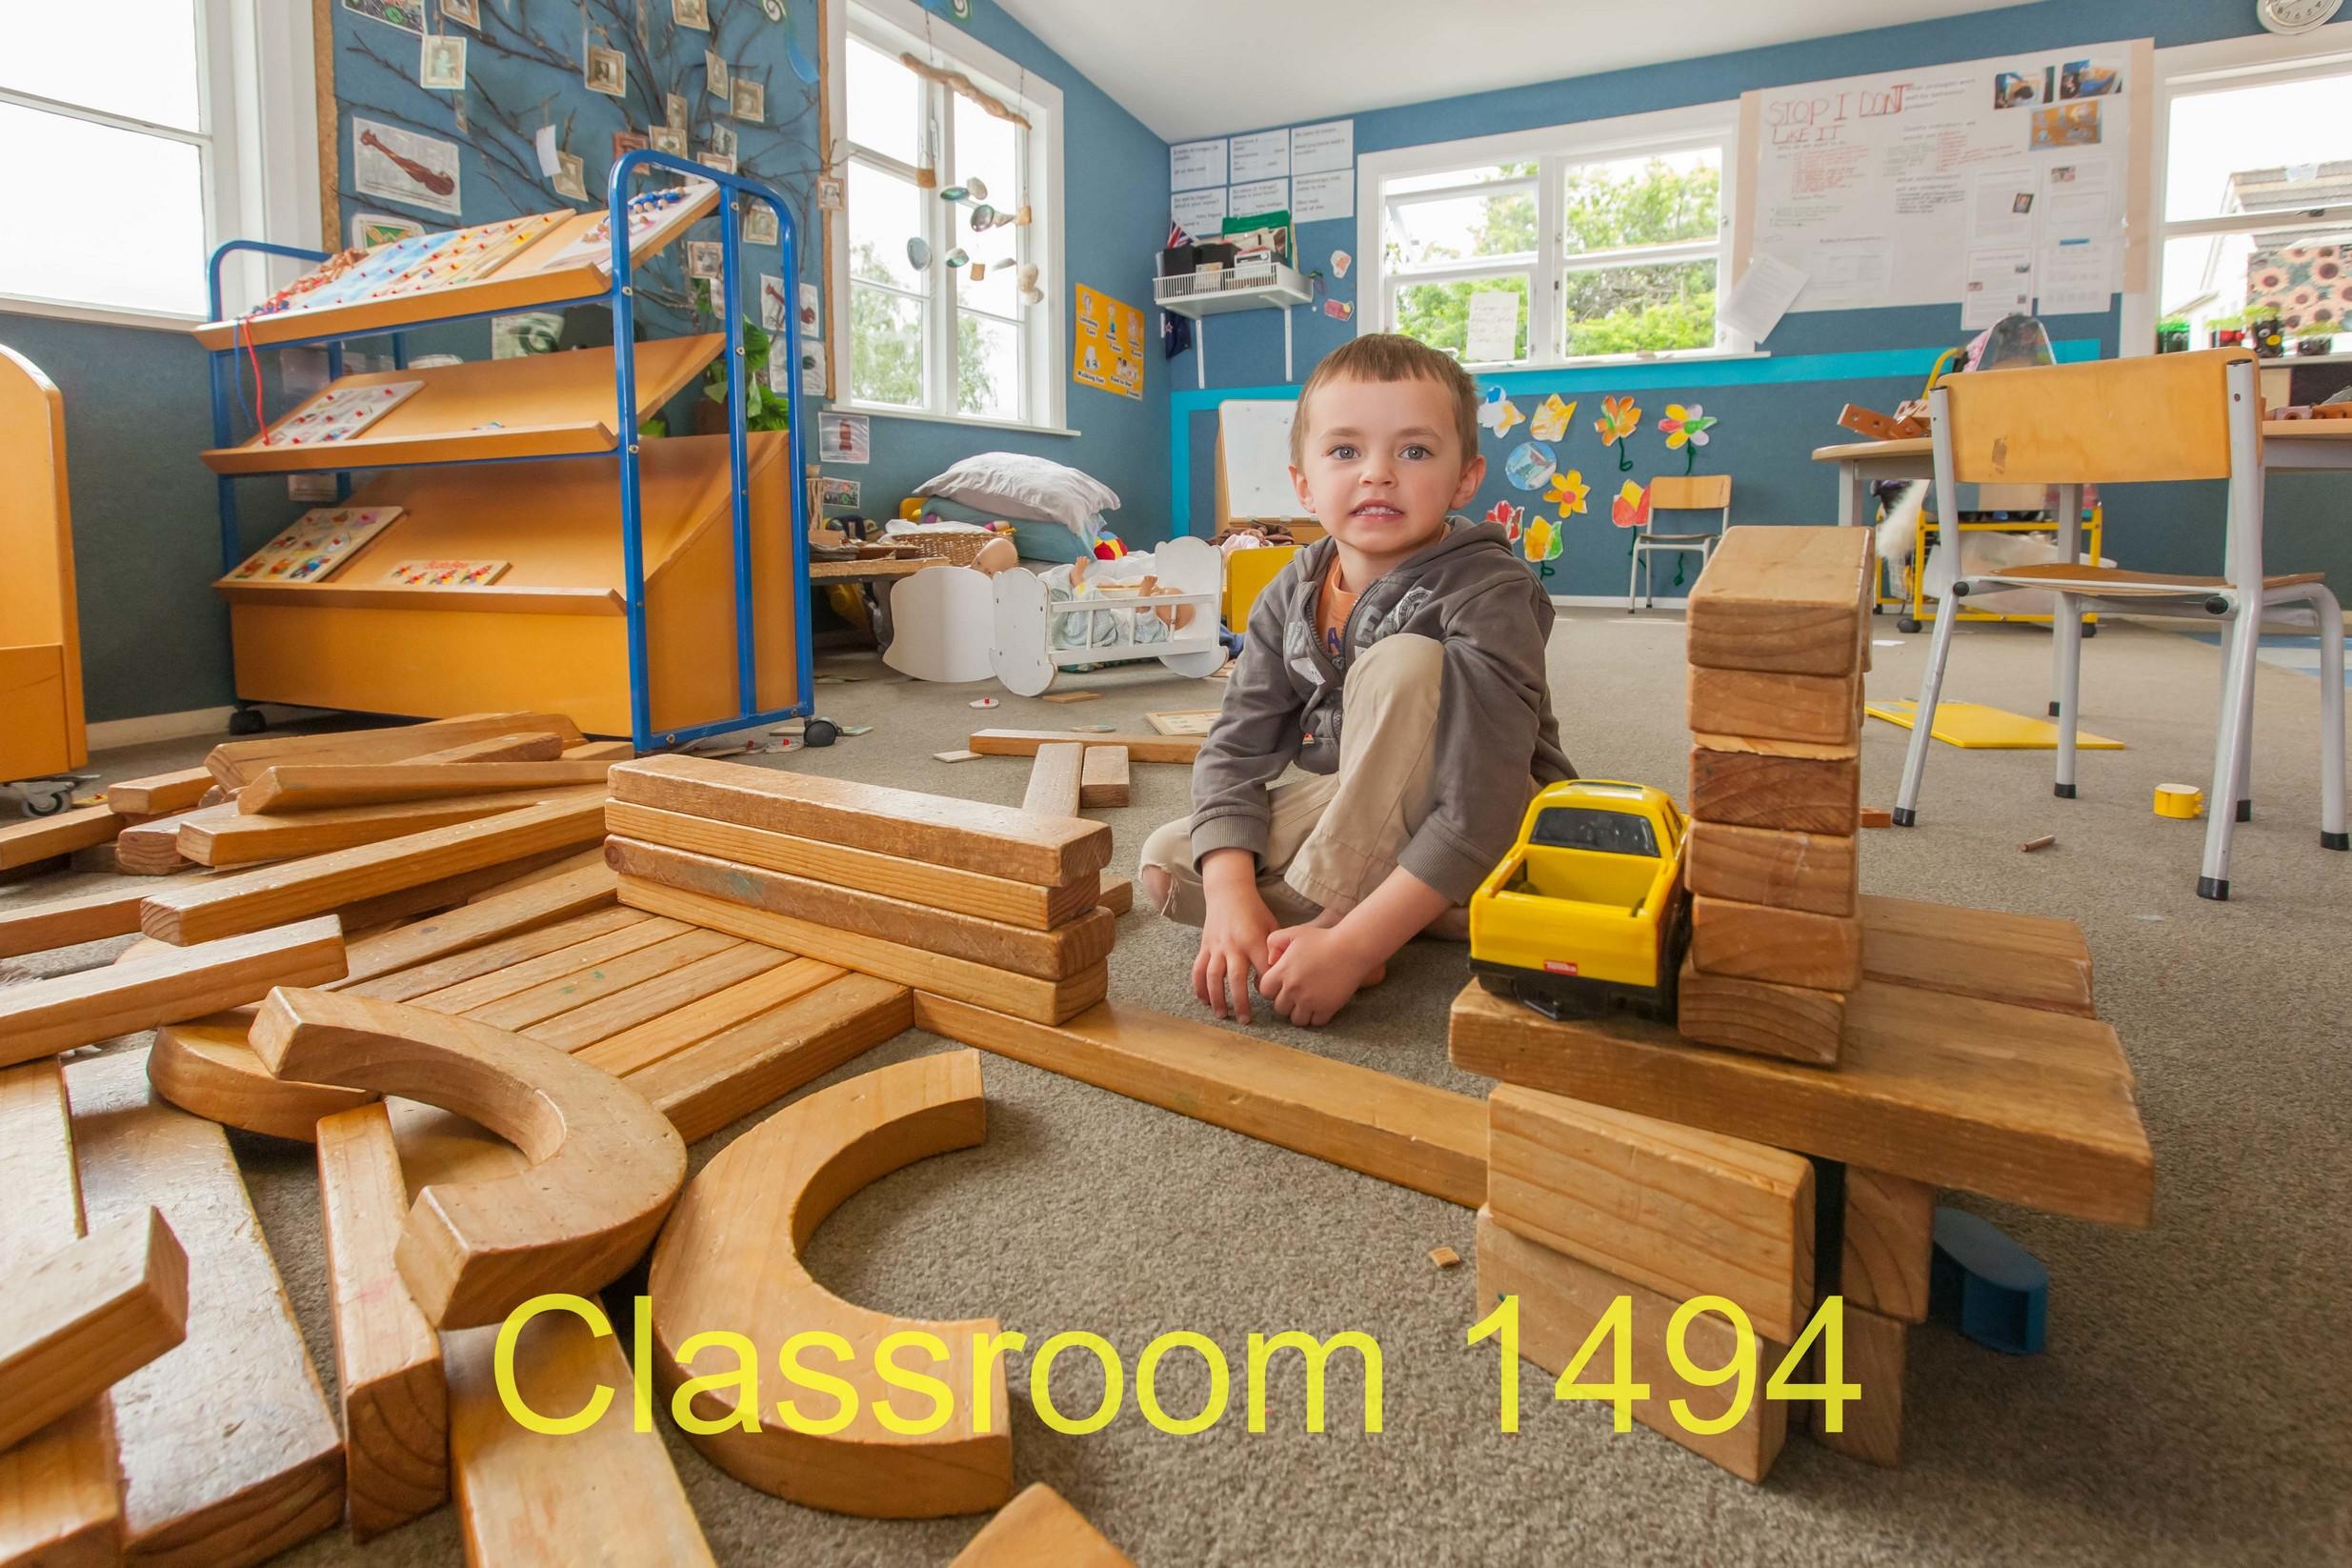 Classroom 1494